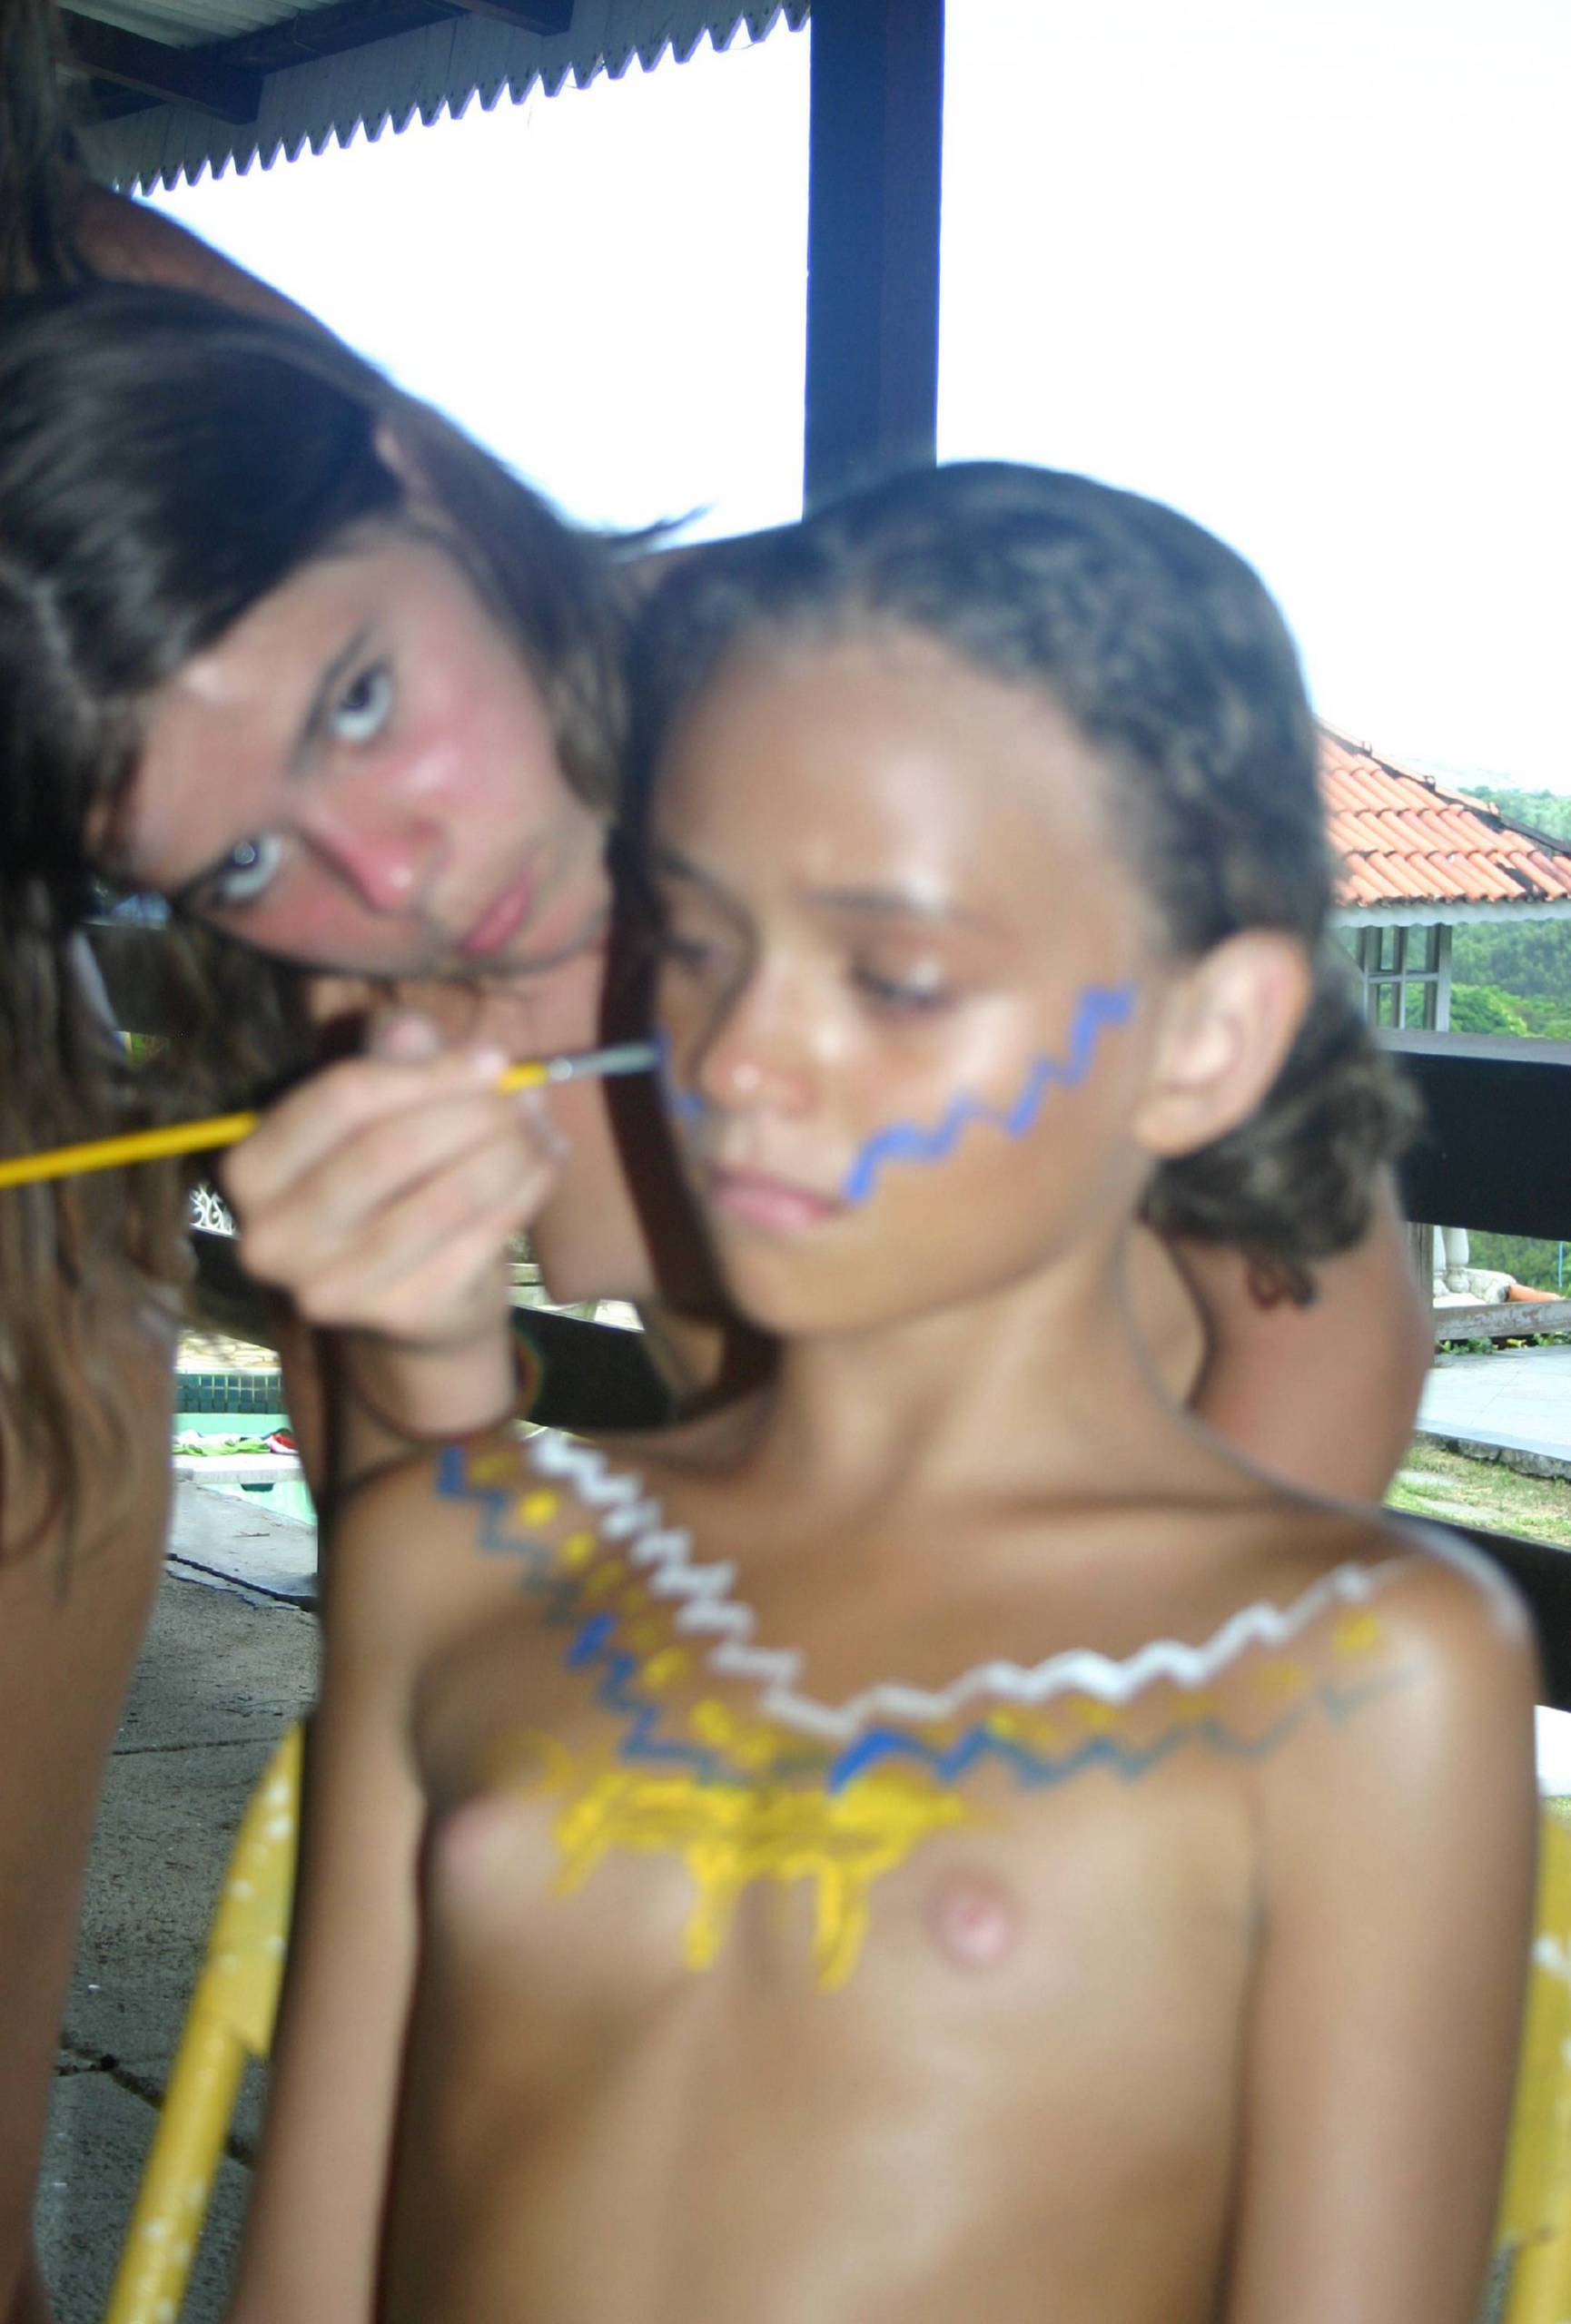 Brazilian Kid Body Painting - 1